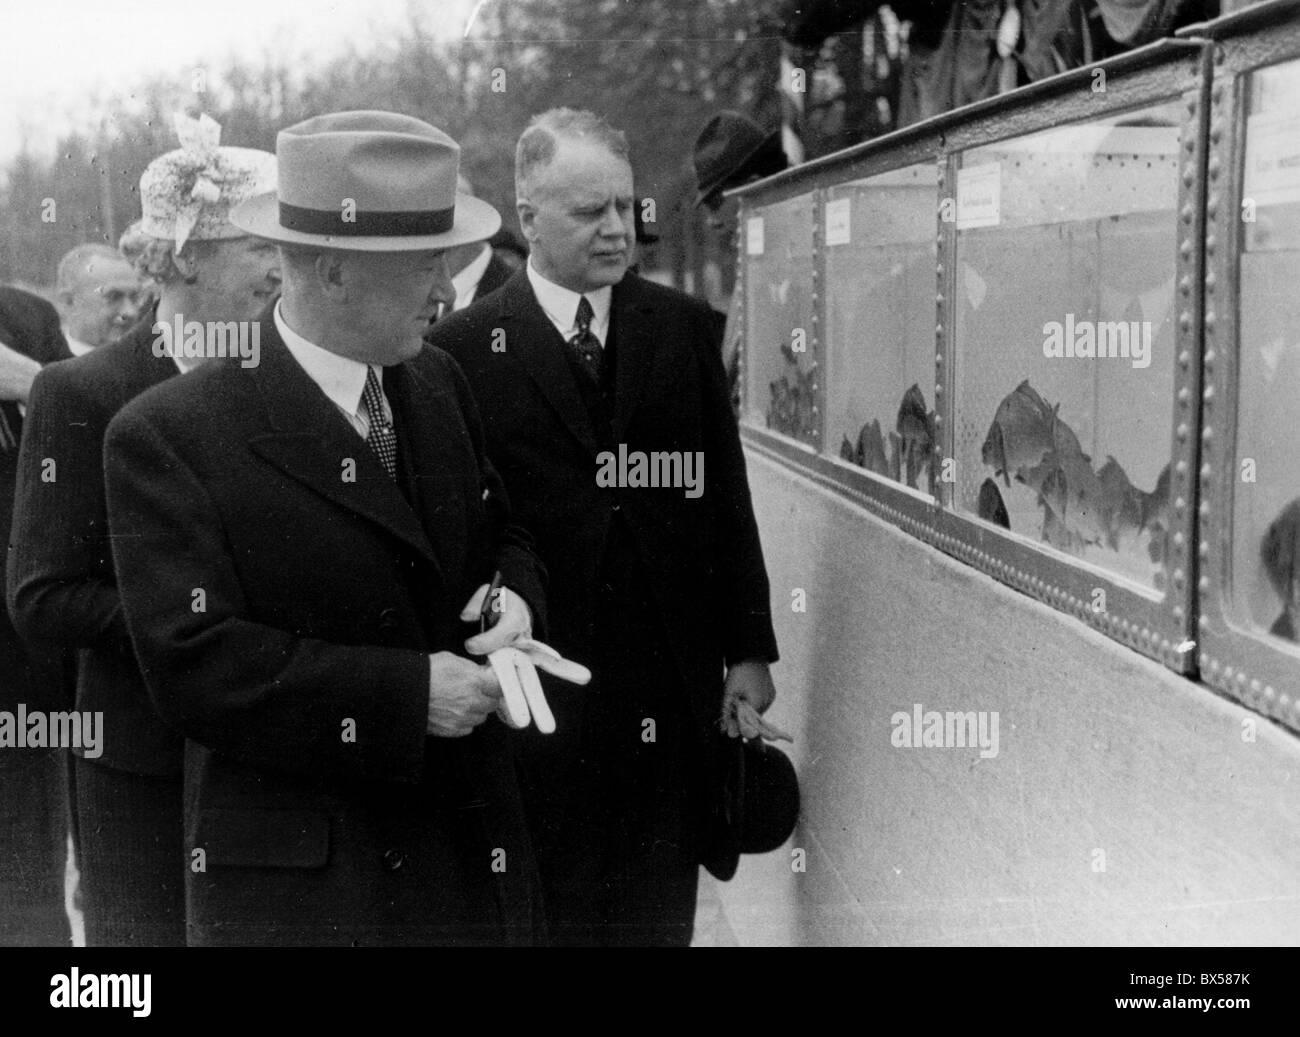 Trebon 1937, President Edvard Benes of Czechoslovakia accompanied by his wife Hana during town visit. - Stock Image